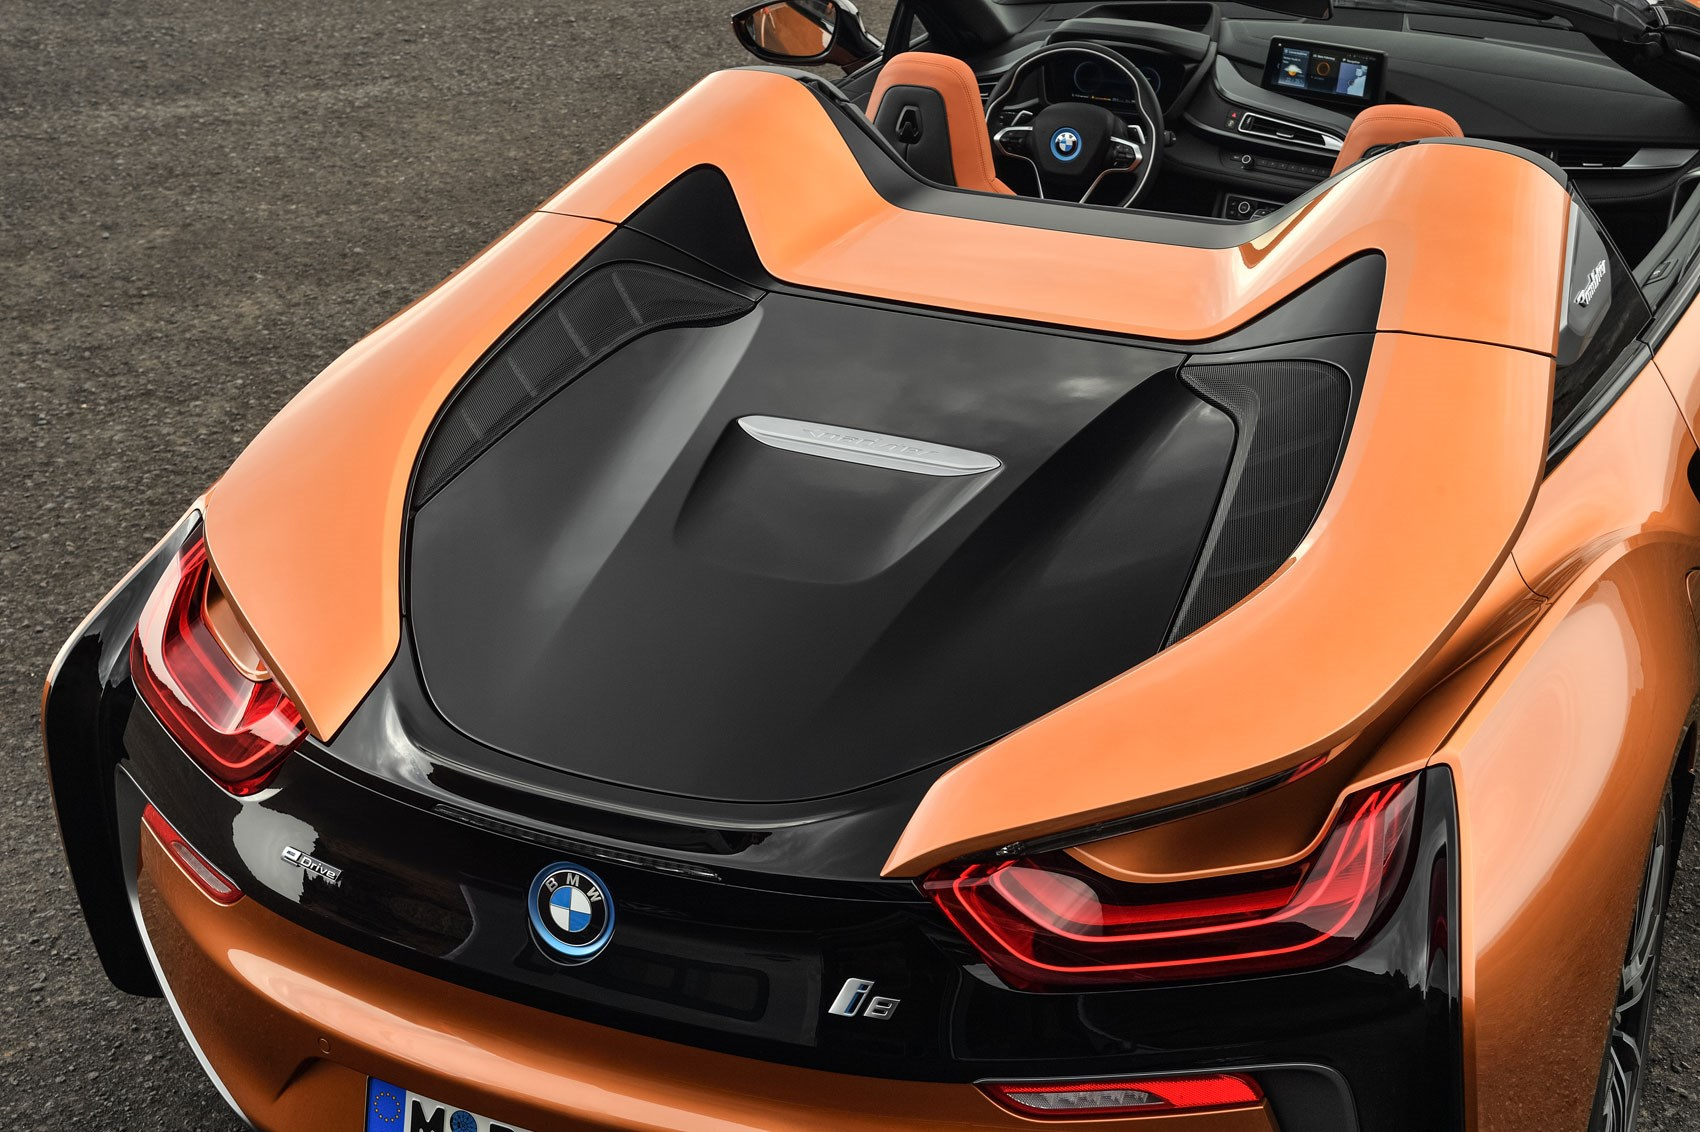 Soft Top Super Hybrid 2018 Bmw I8 Roadster Revealed Car Magazine